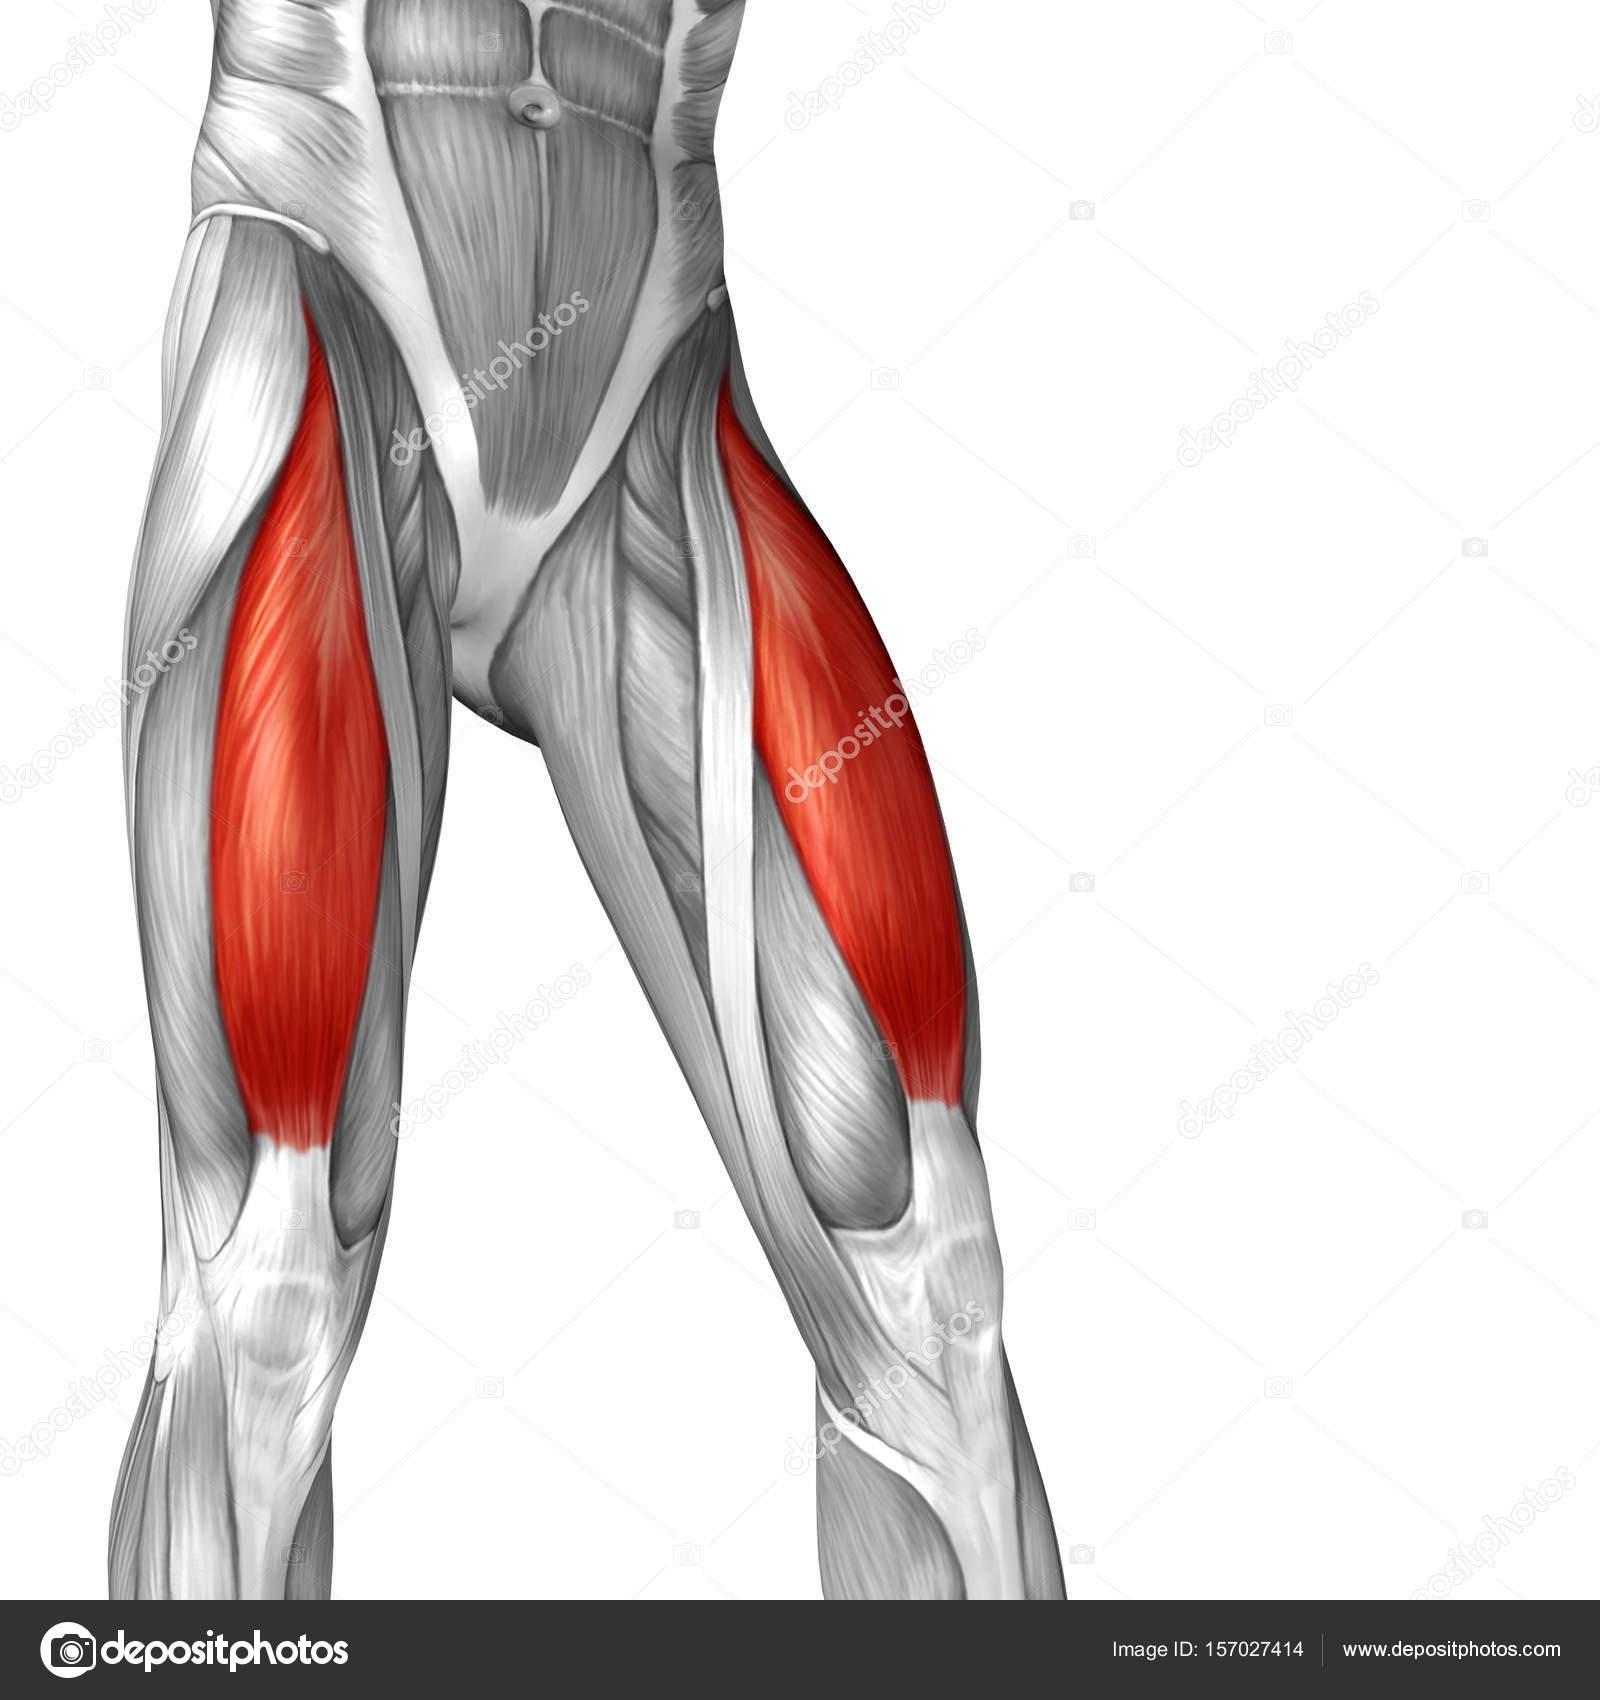 anatomía humana piernas superiores — Foto de stock © design36 #157027414